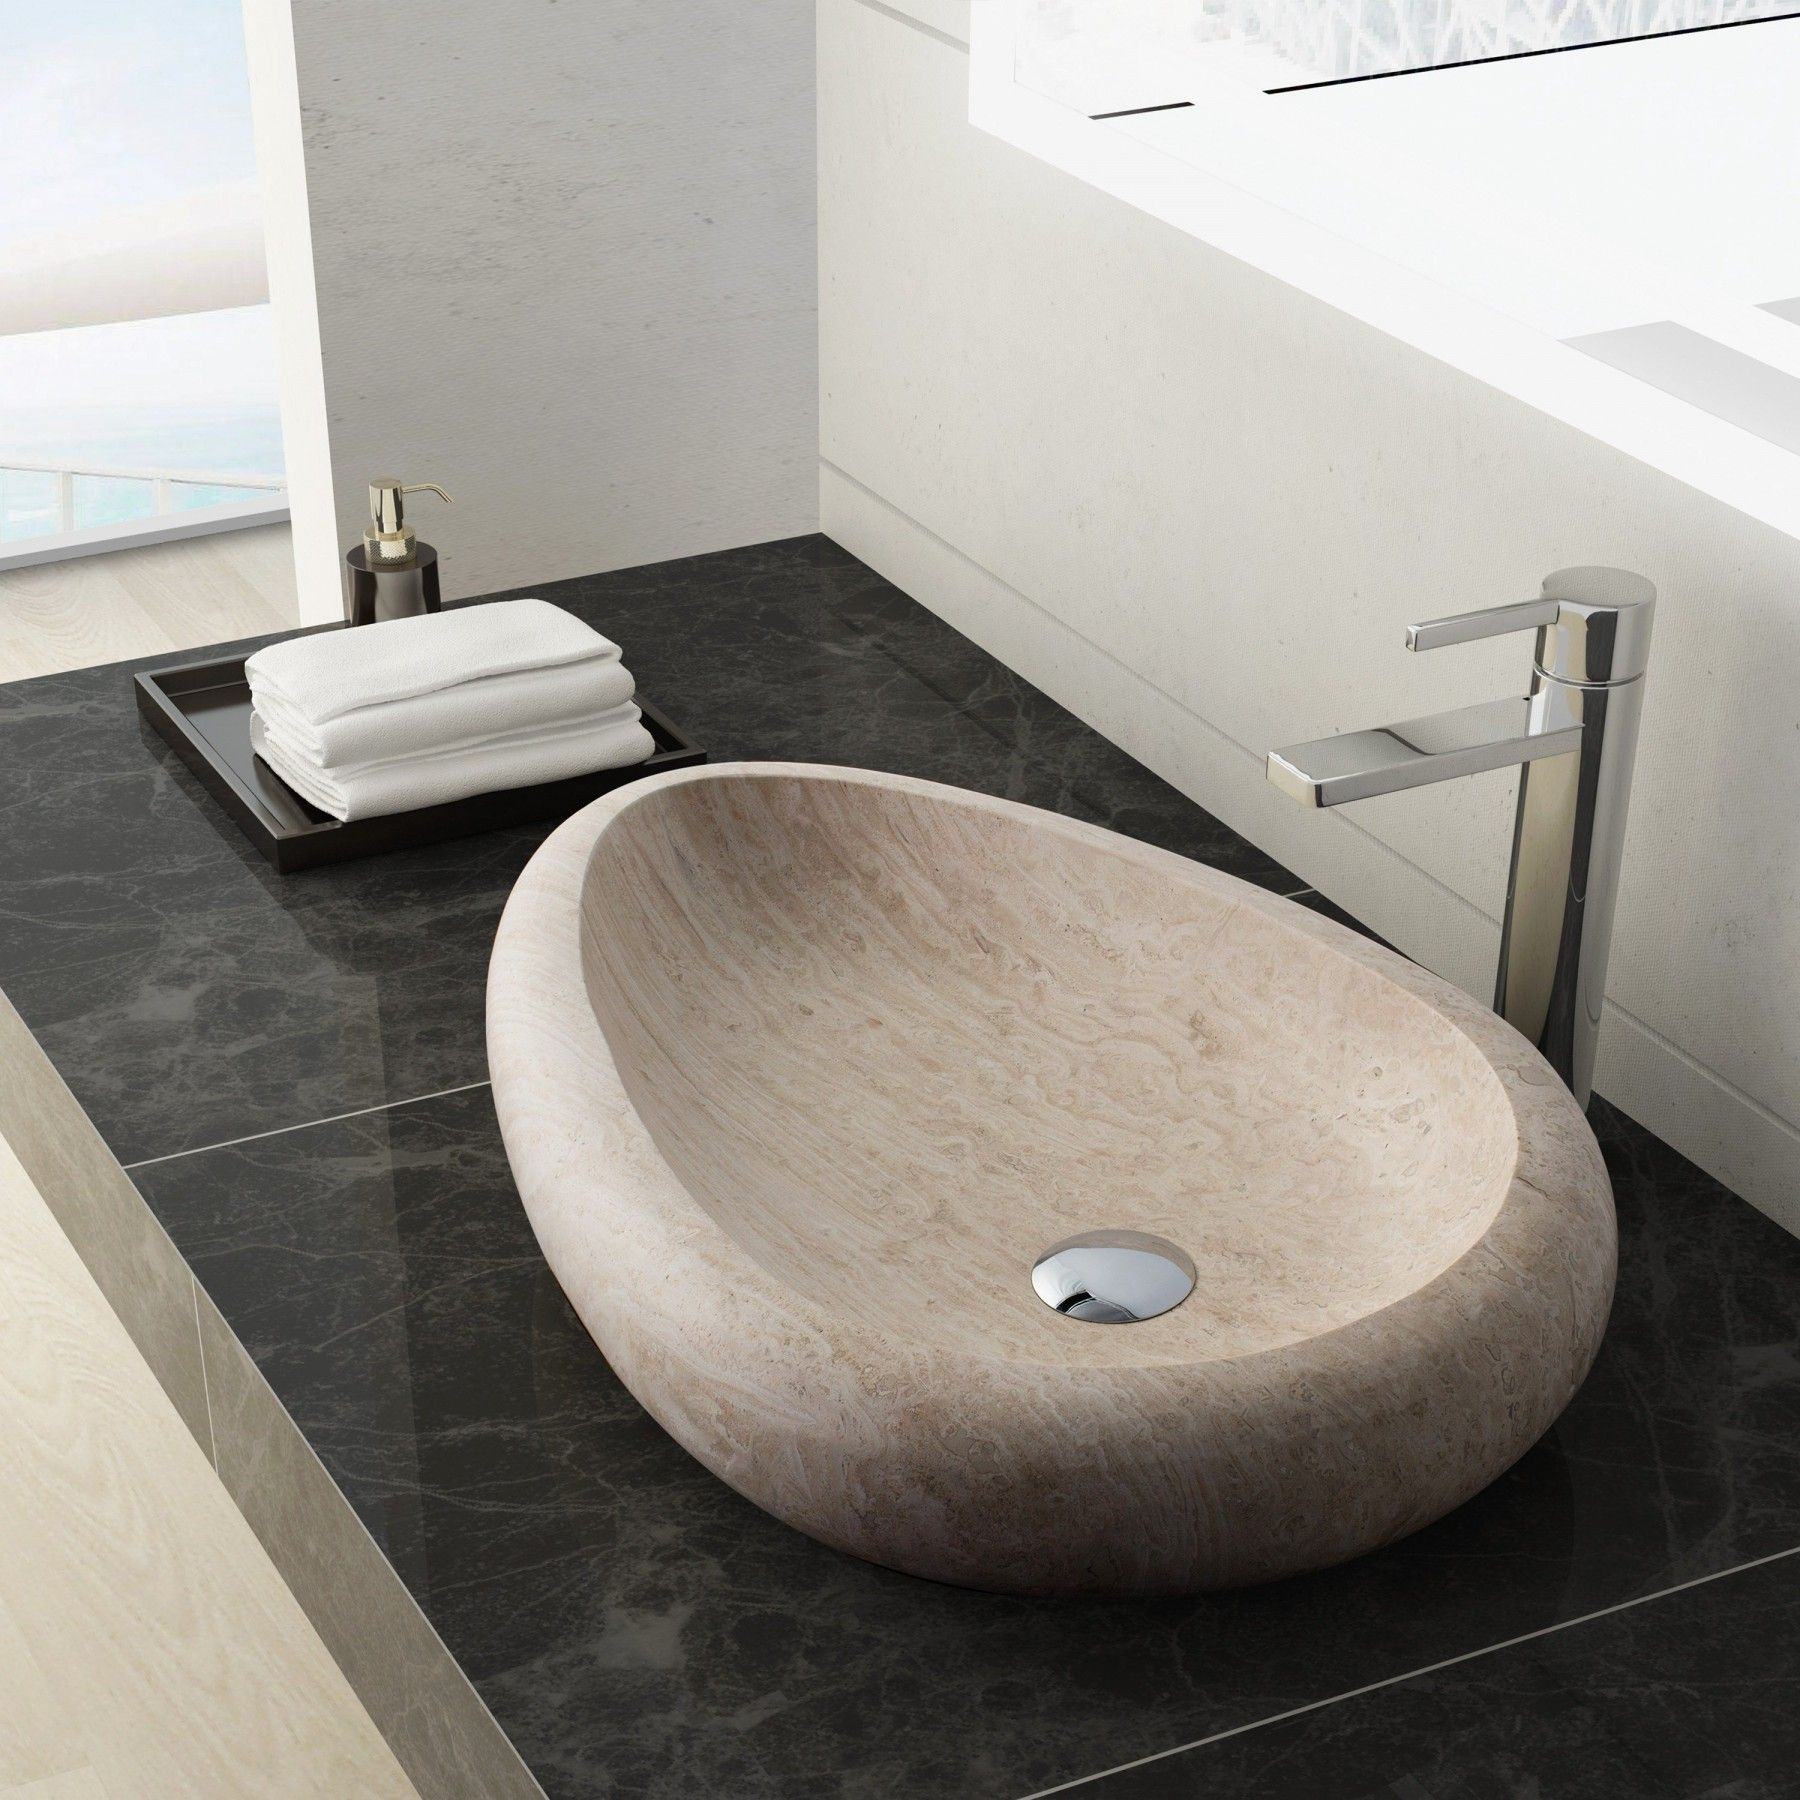 Colstrip Stone Vessel Sink White Travertine Stone Vessel Sinks Sink Travertine Sinks